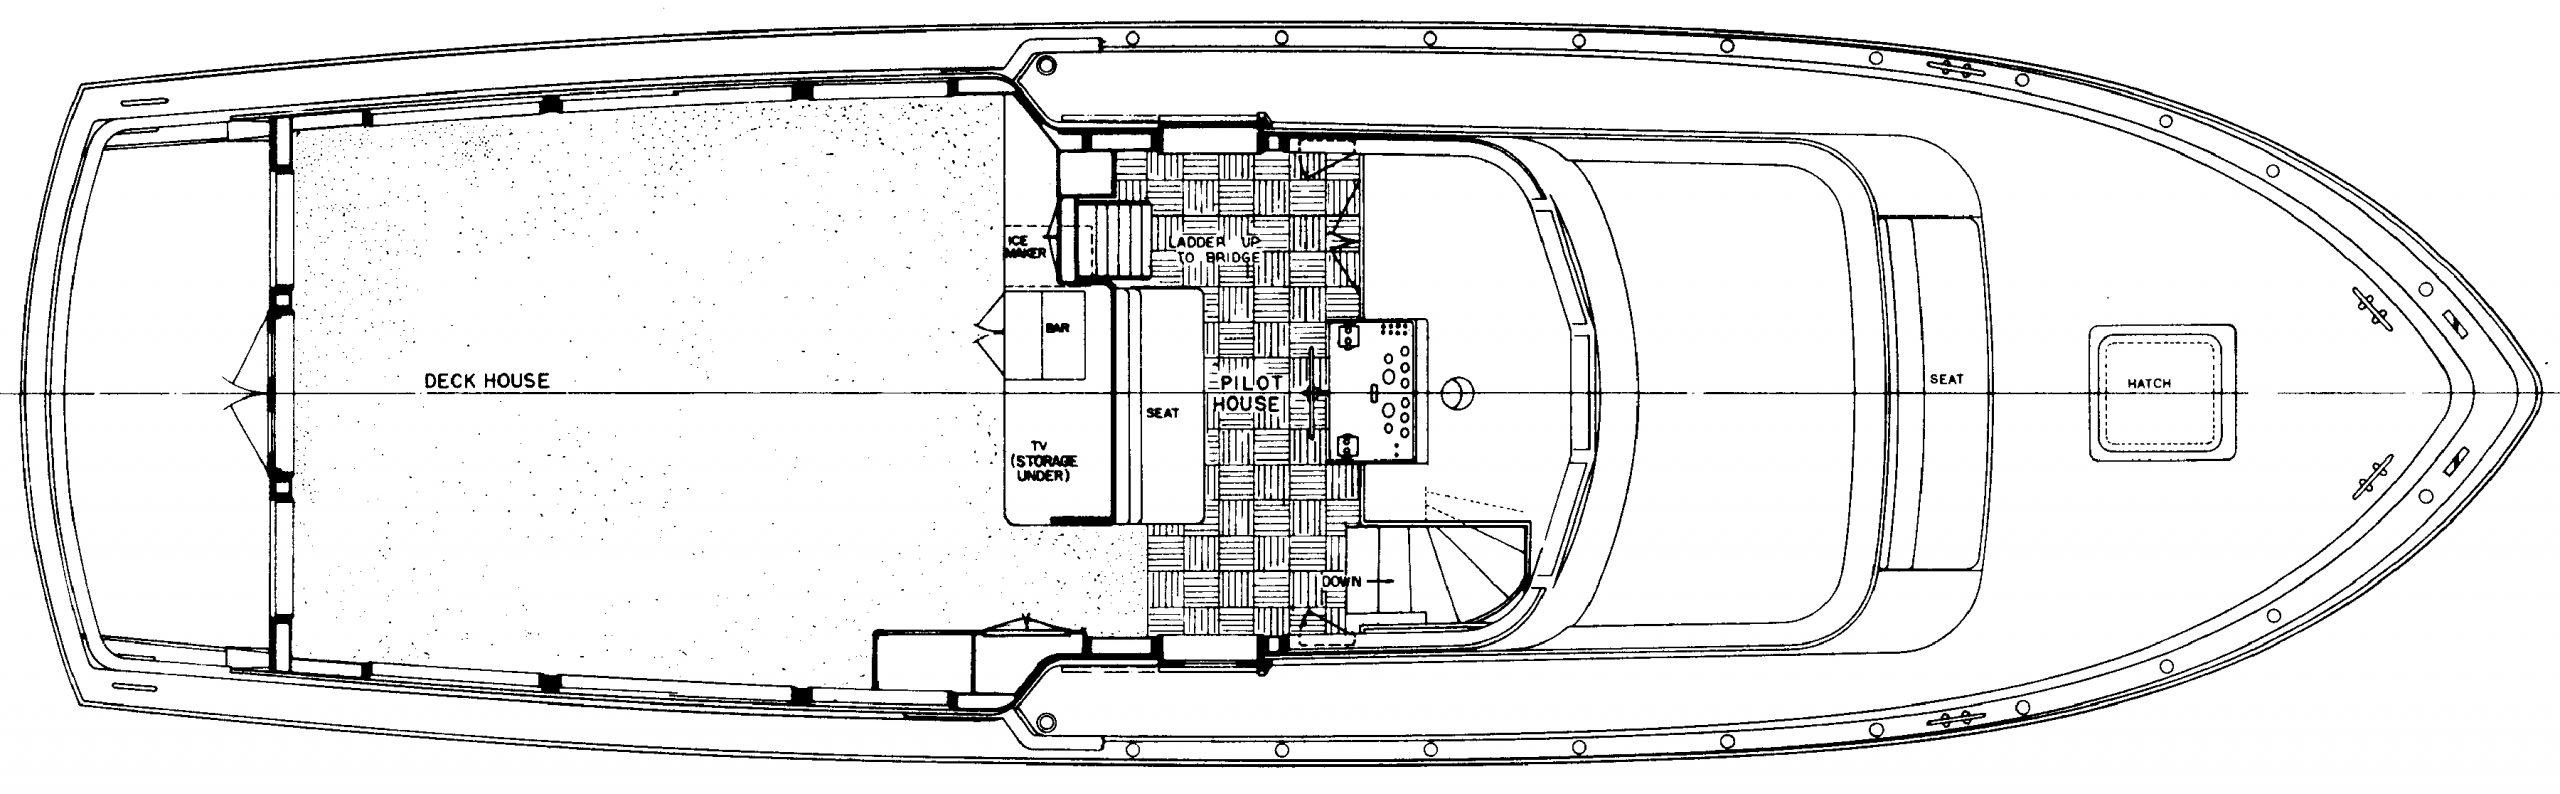 53 Extended Deckhouse Floor Plan 2